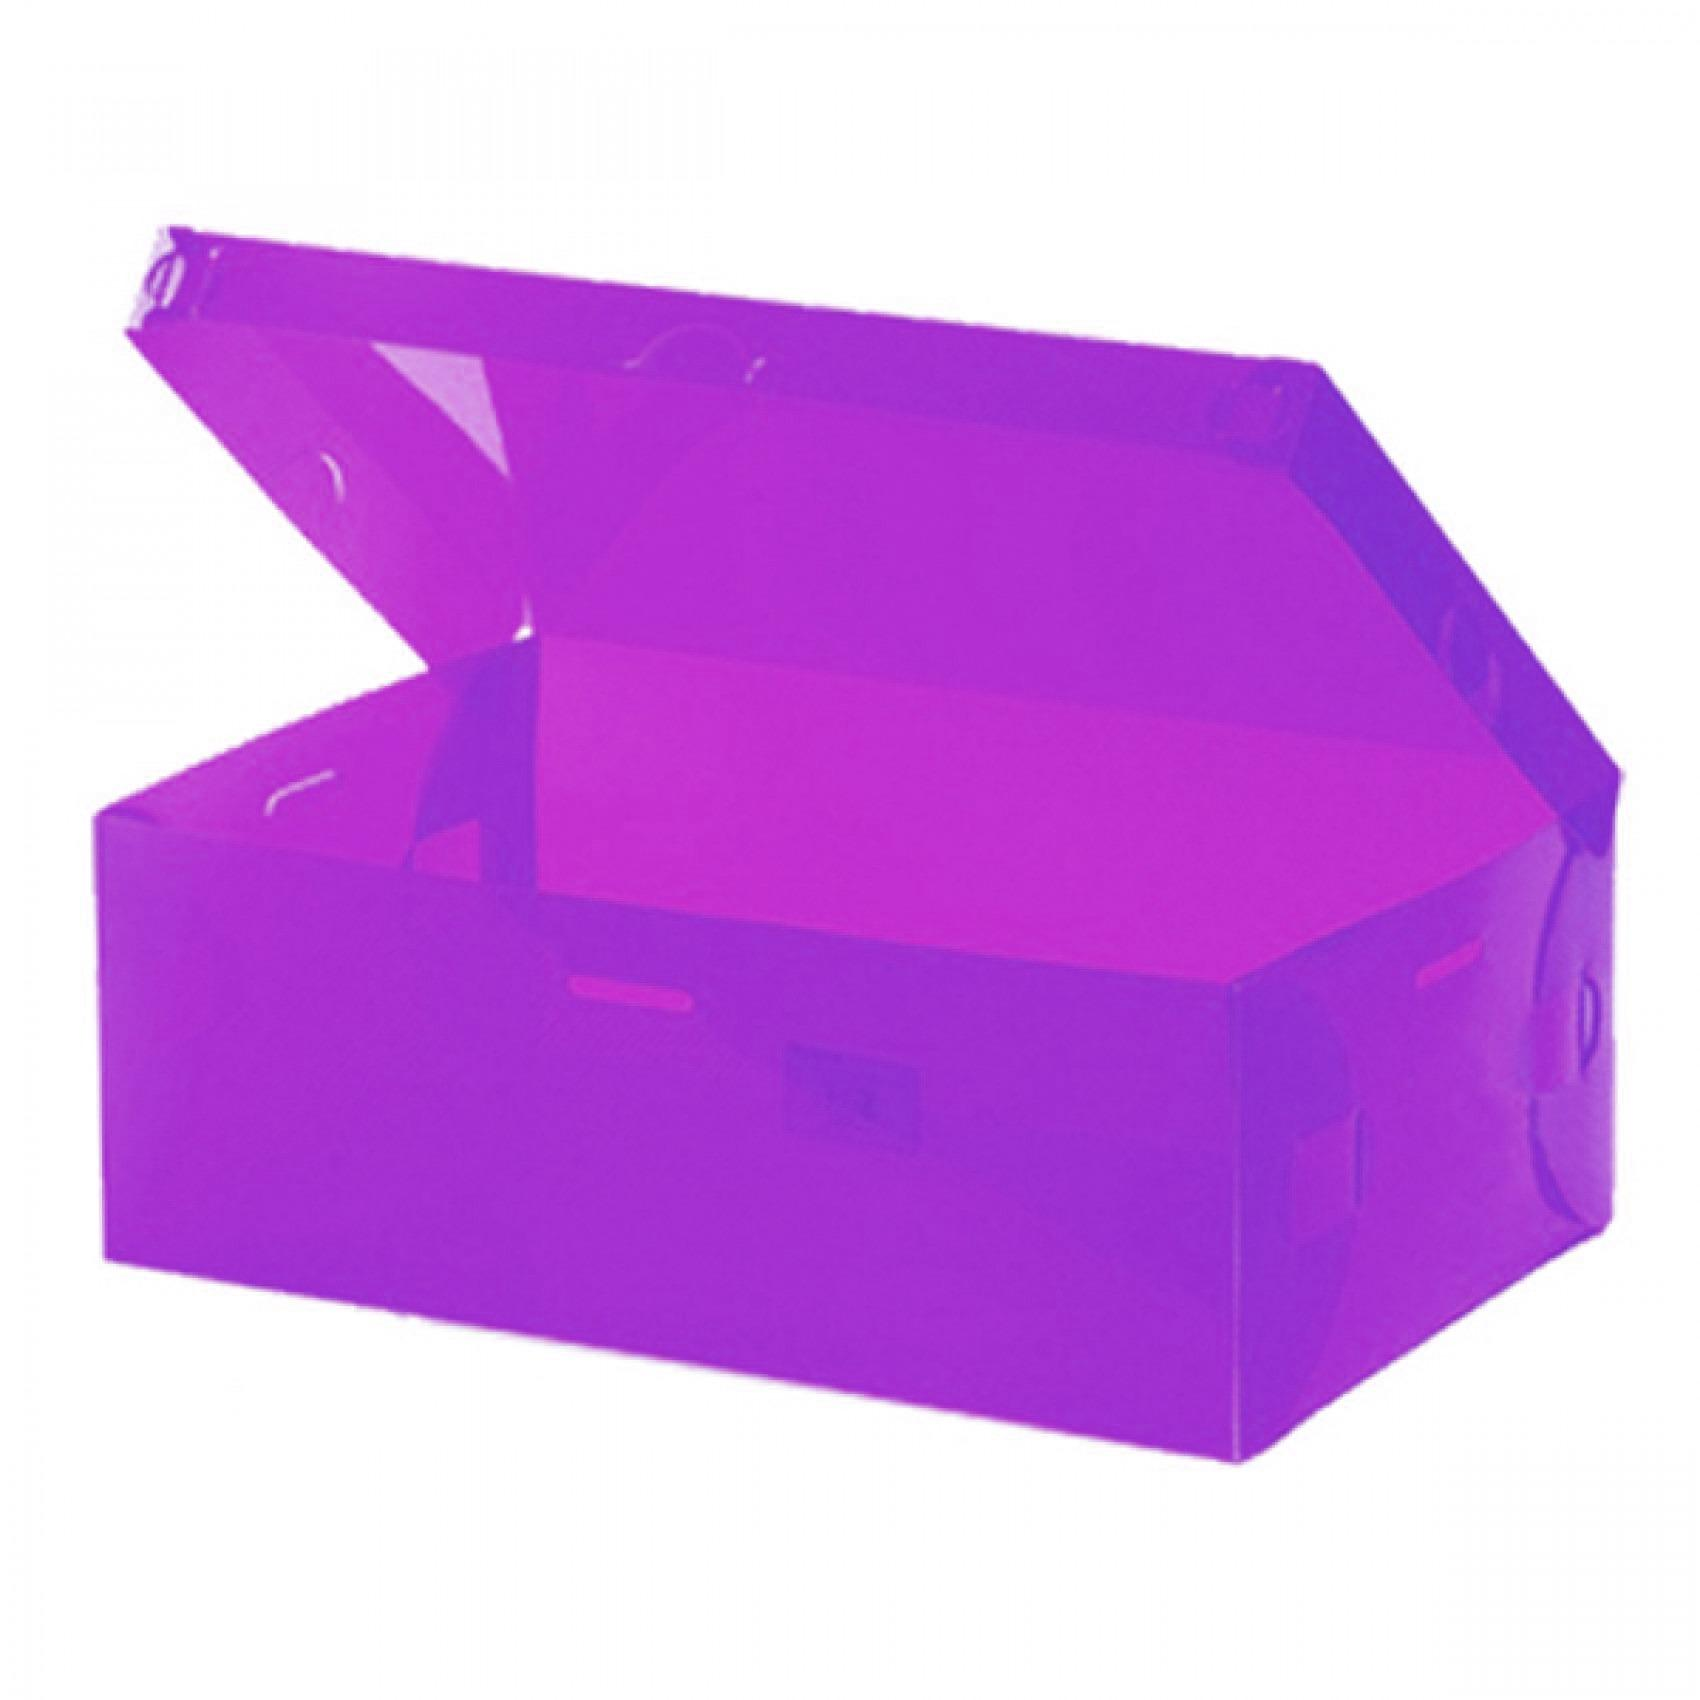 LARIS49 Kotak Sepatu Transparant Shoes Box Warna Warni Transparan - KSP